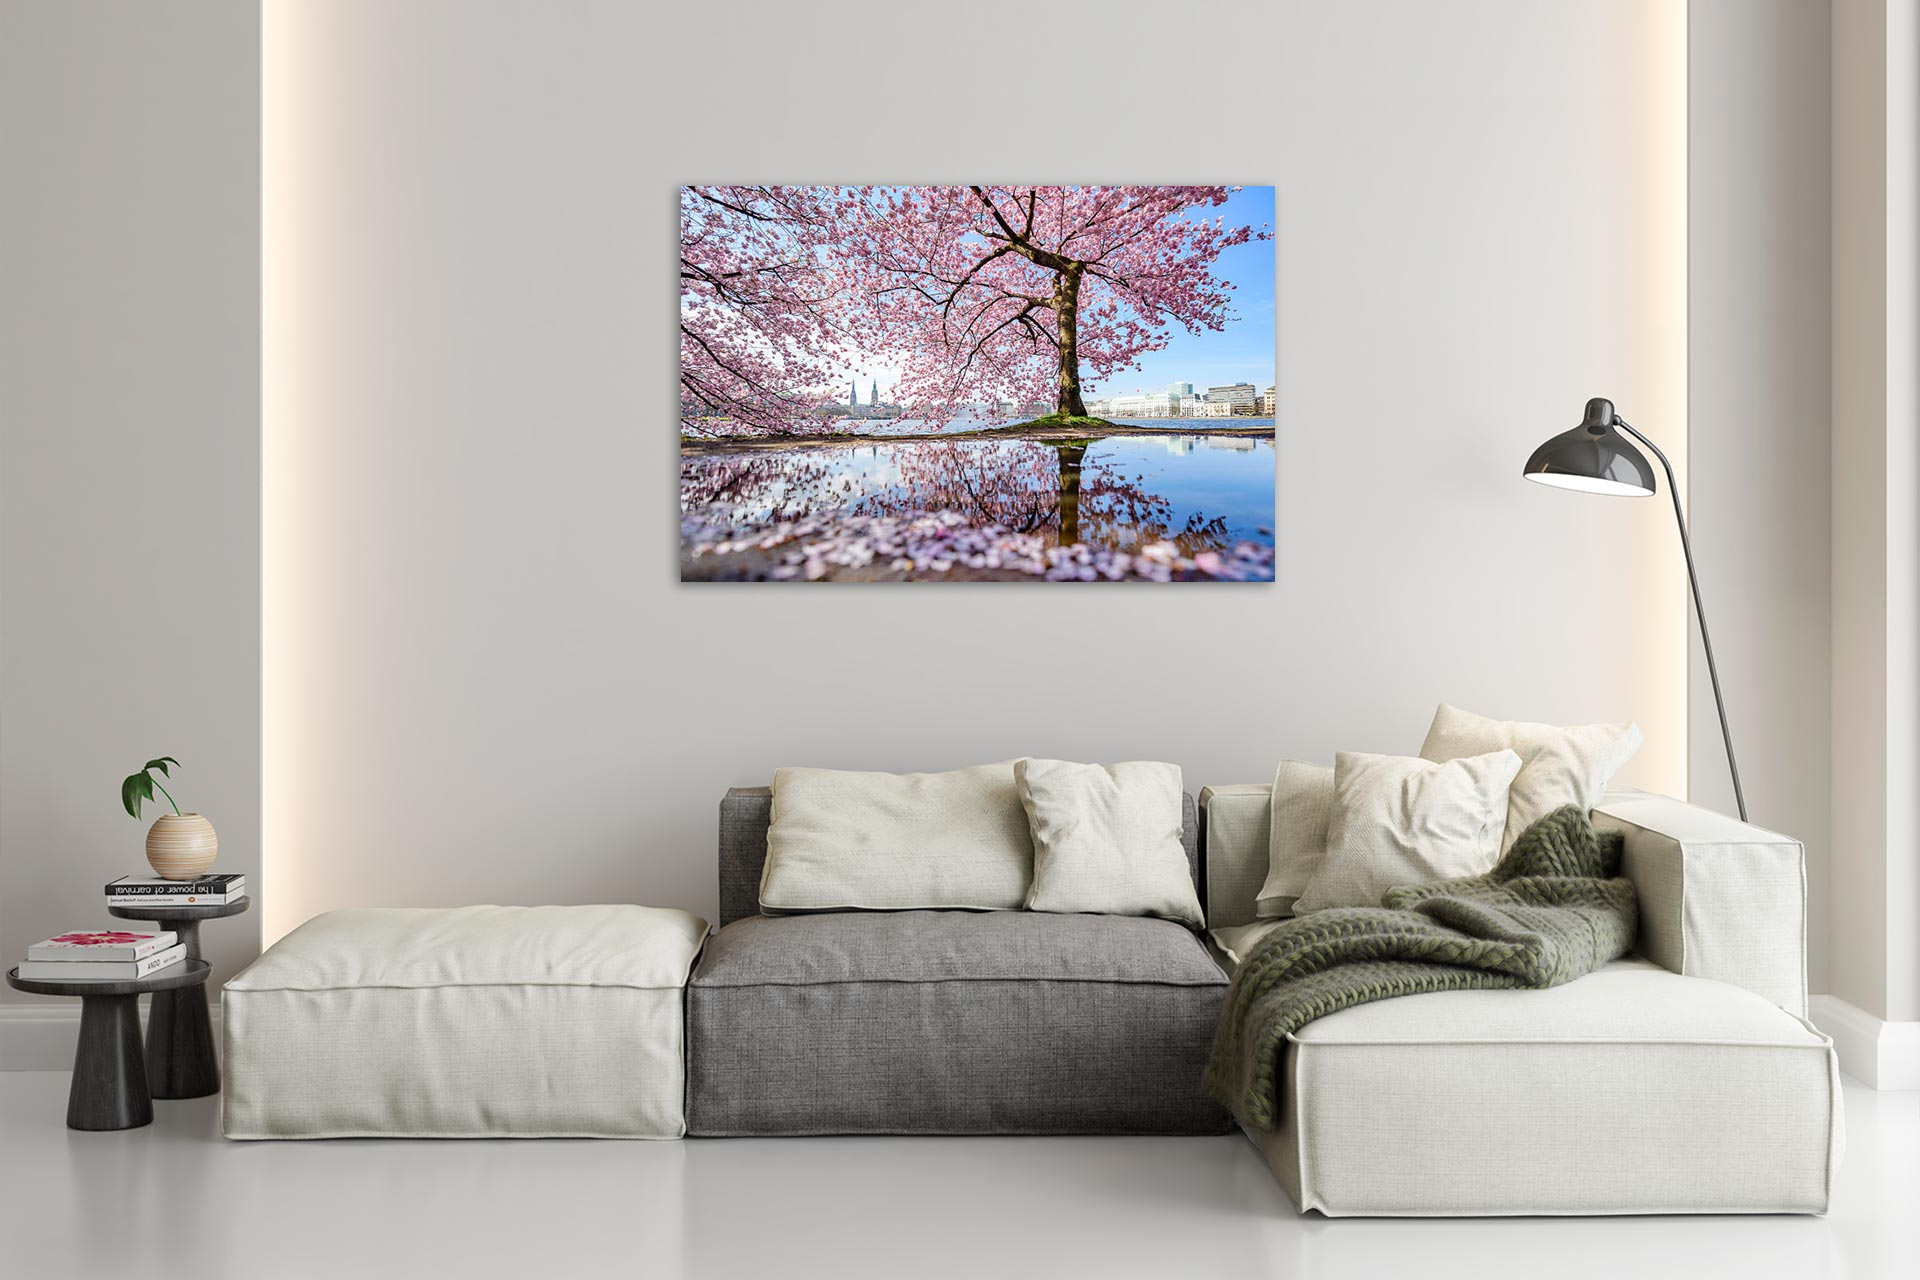 NL069-alster-fruehling-kirschbluete-hamburg-wandbild-auf-leinwand-acrylglas-aludibond-wohnzimmer